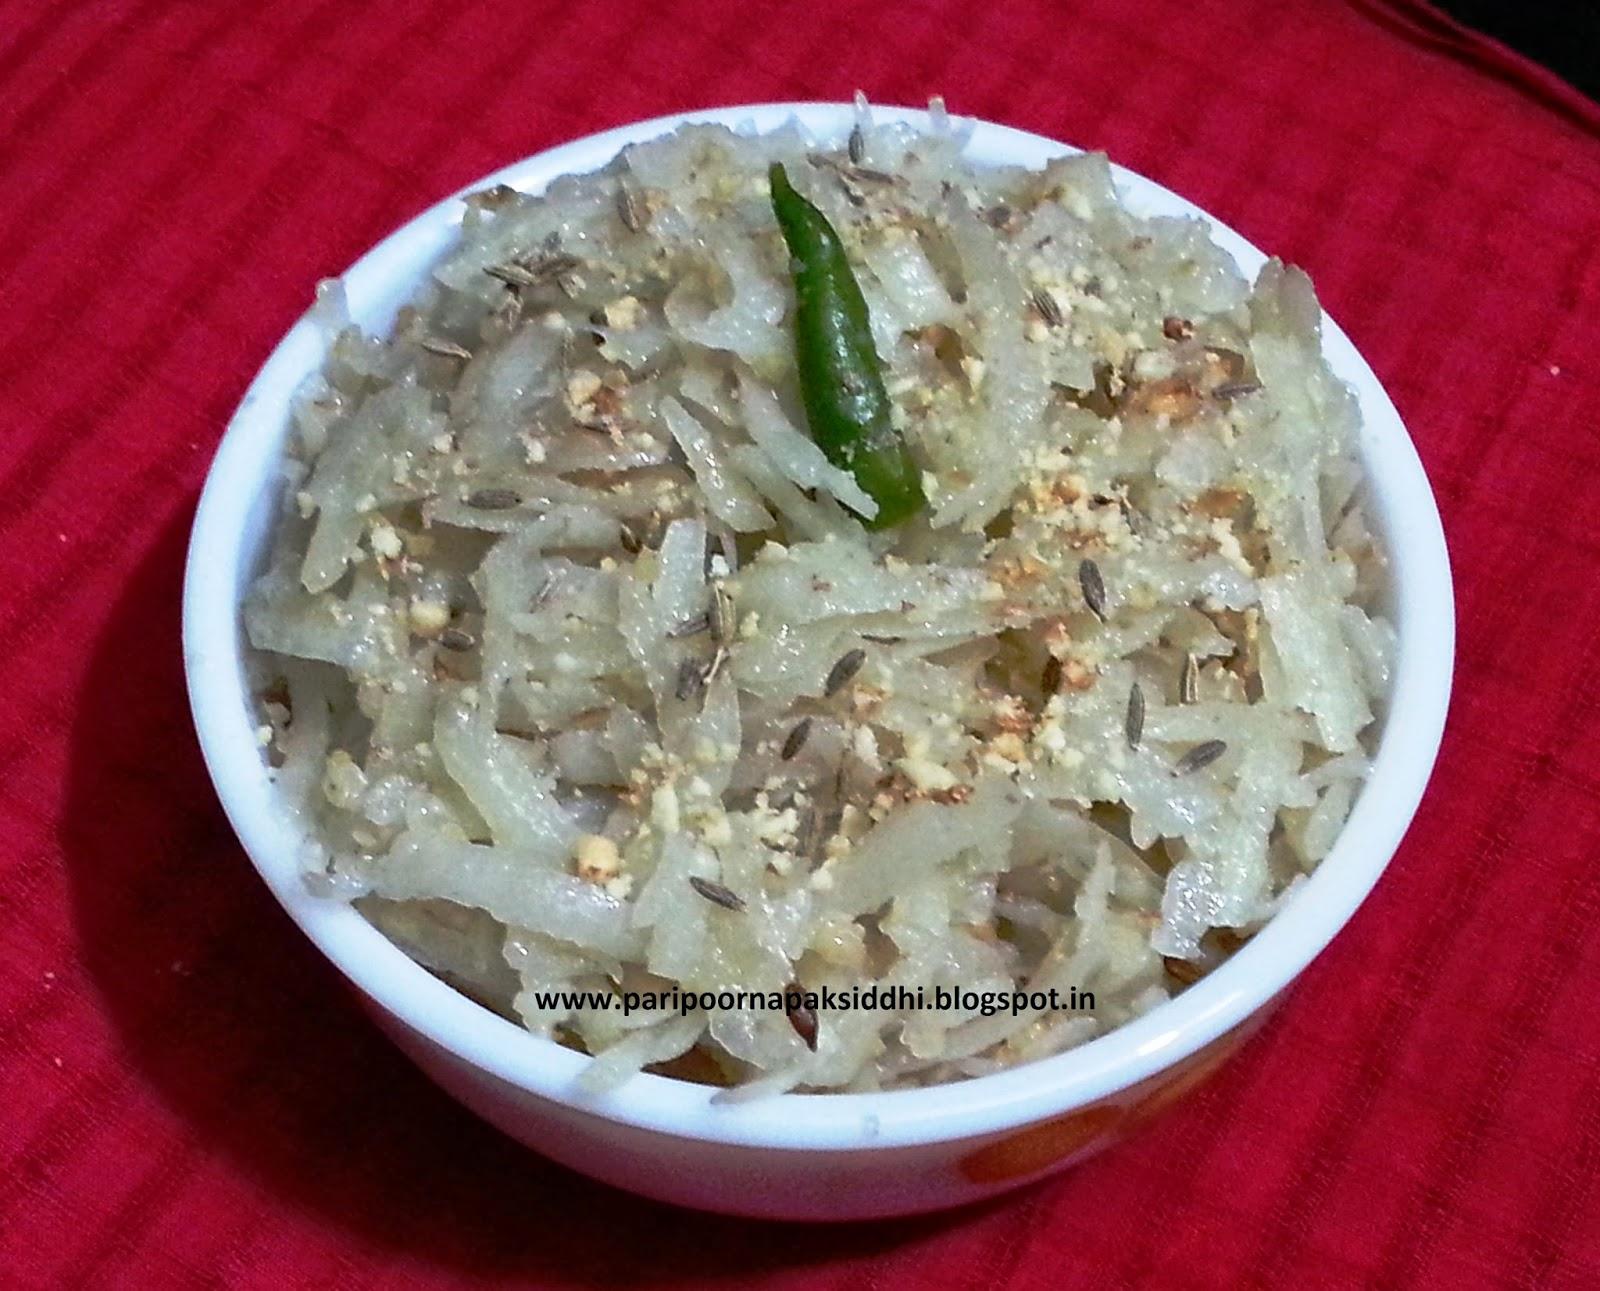 ... Paksiddhi : BATATA KEES (UPWAS) / STIR FRIED GRATED POTATOES (FASTING